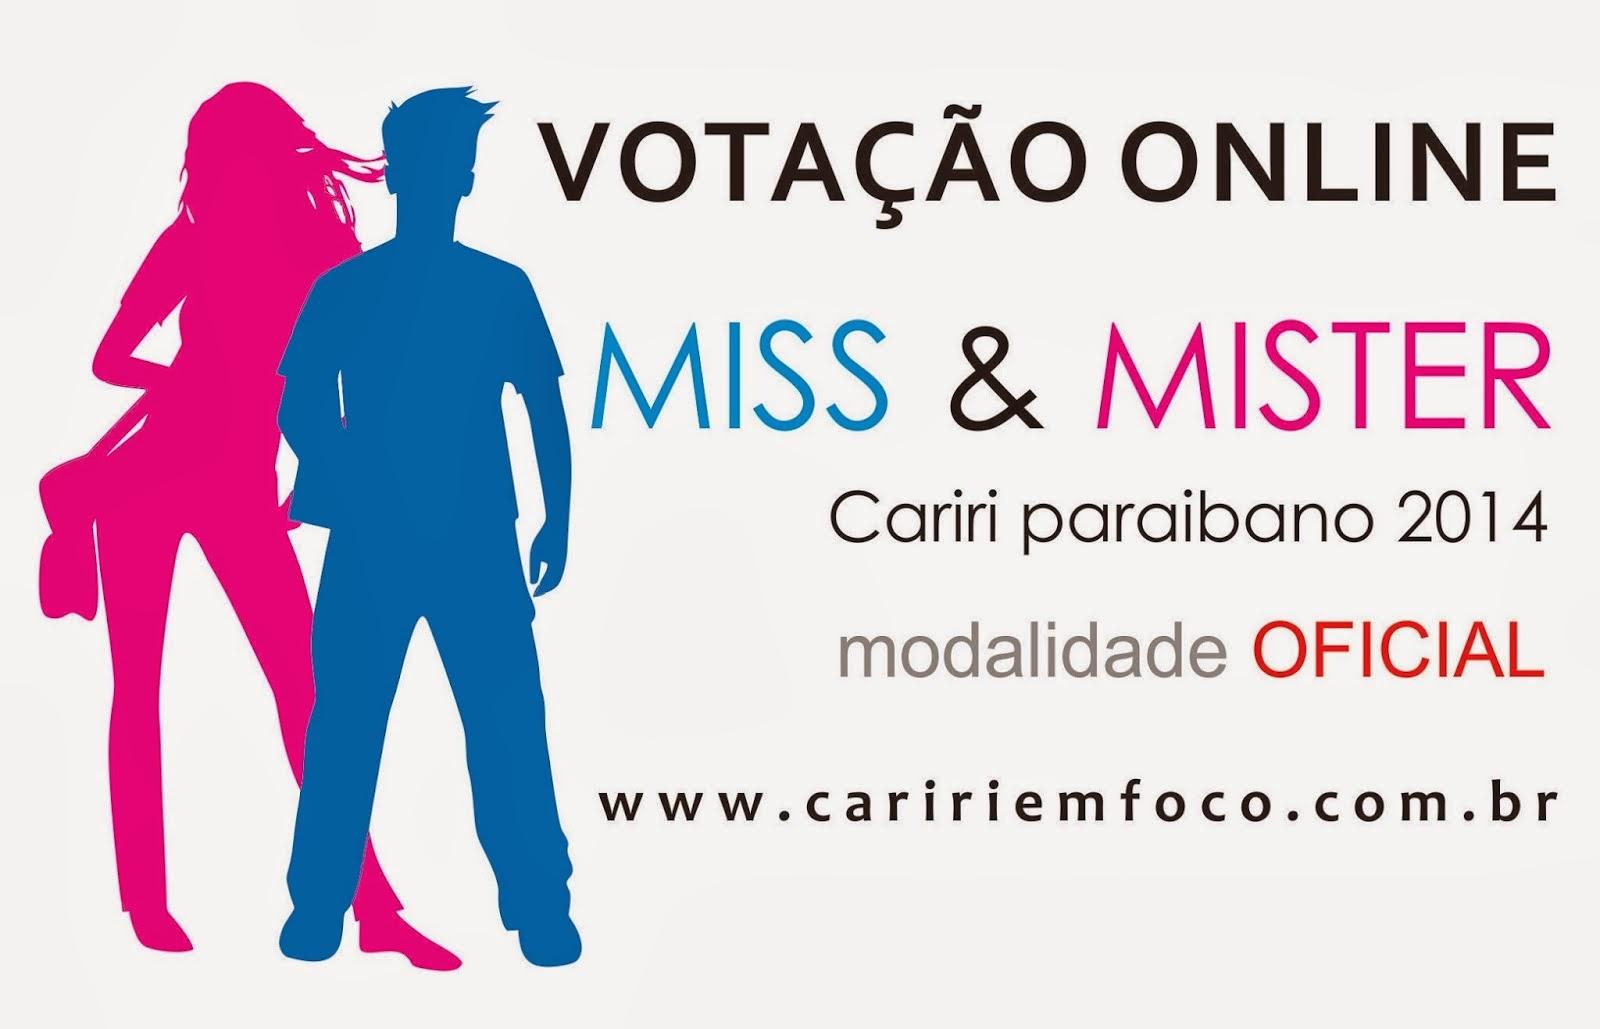 http://www.caririemfoco.com.br/2014/02/votacao-oficial-miss-mister-cariri.html#axzz2t7Ibu8ms